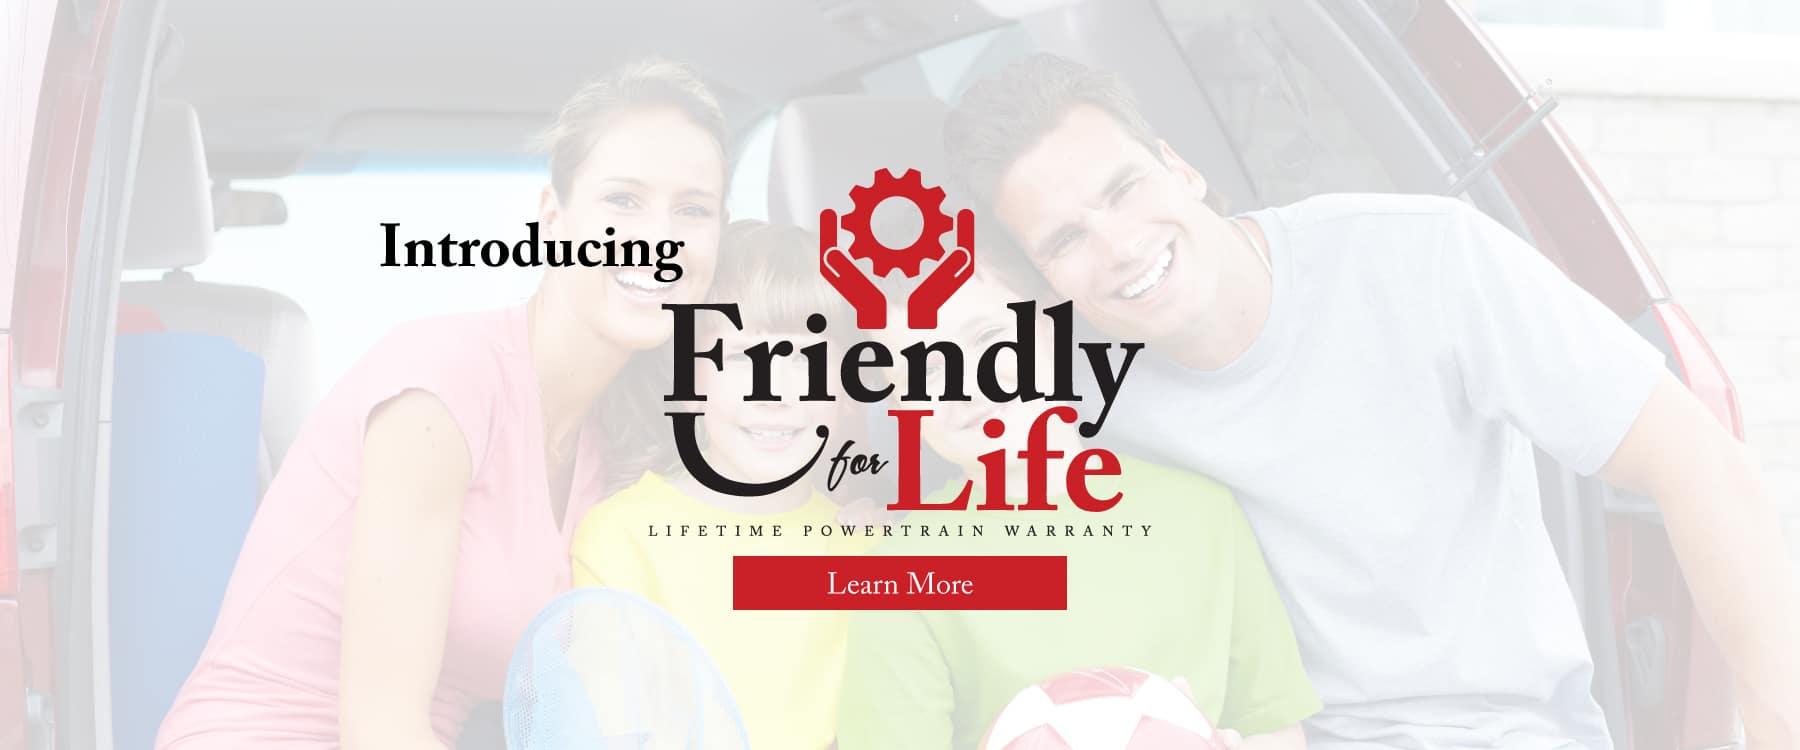 Friendly For Life Lifetime Powertrain Warranty